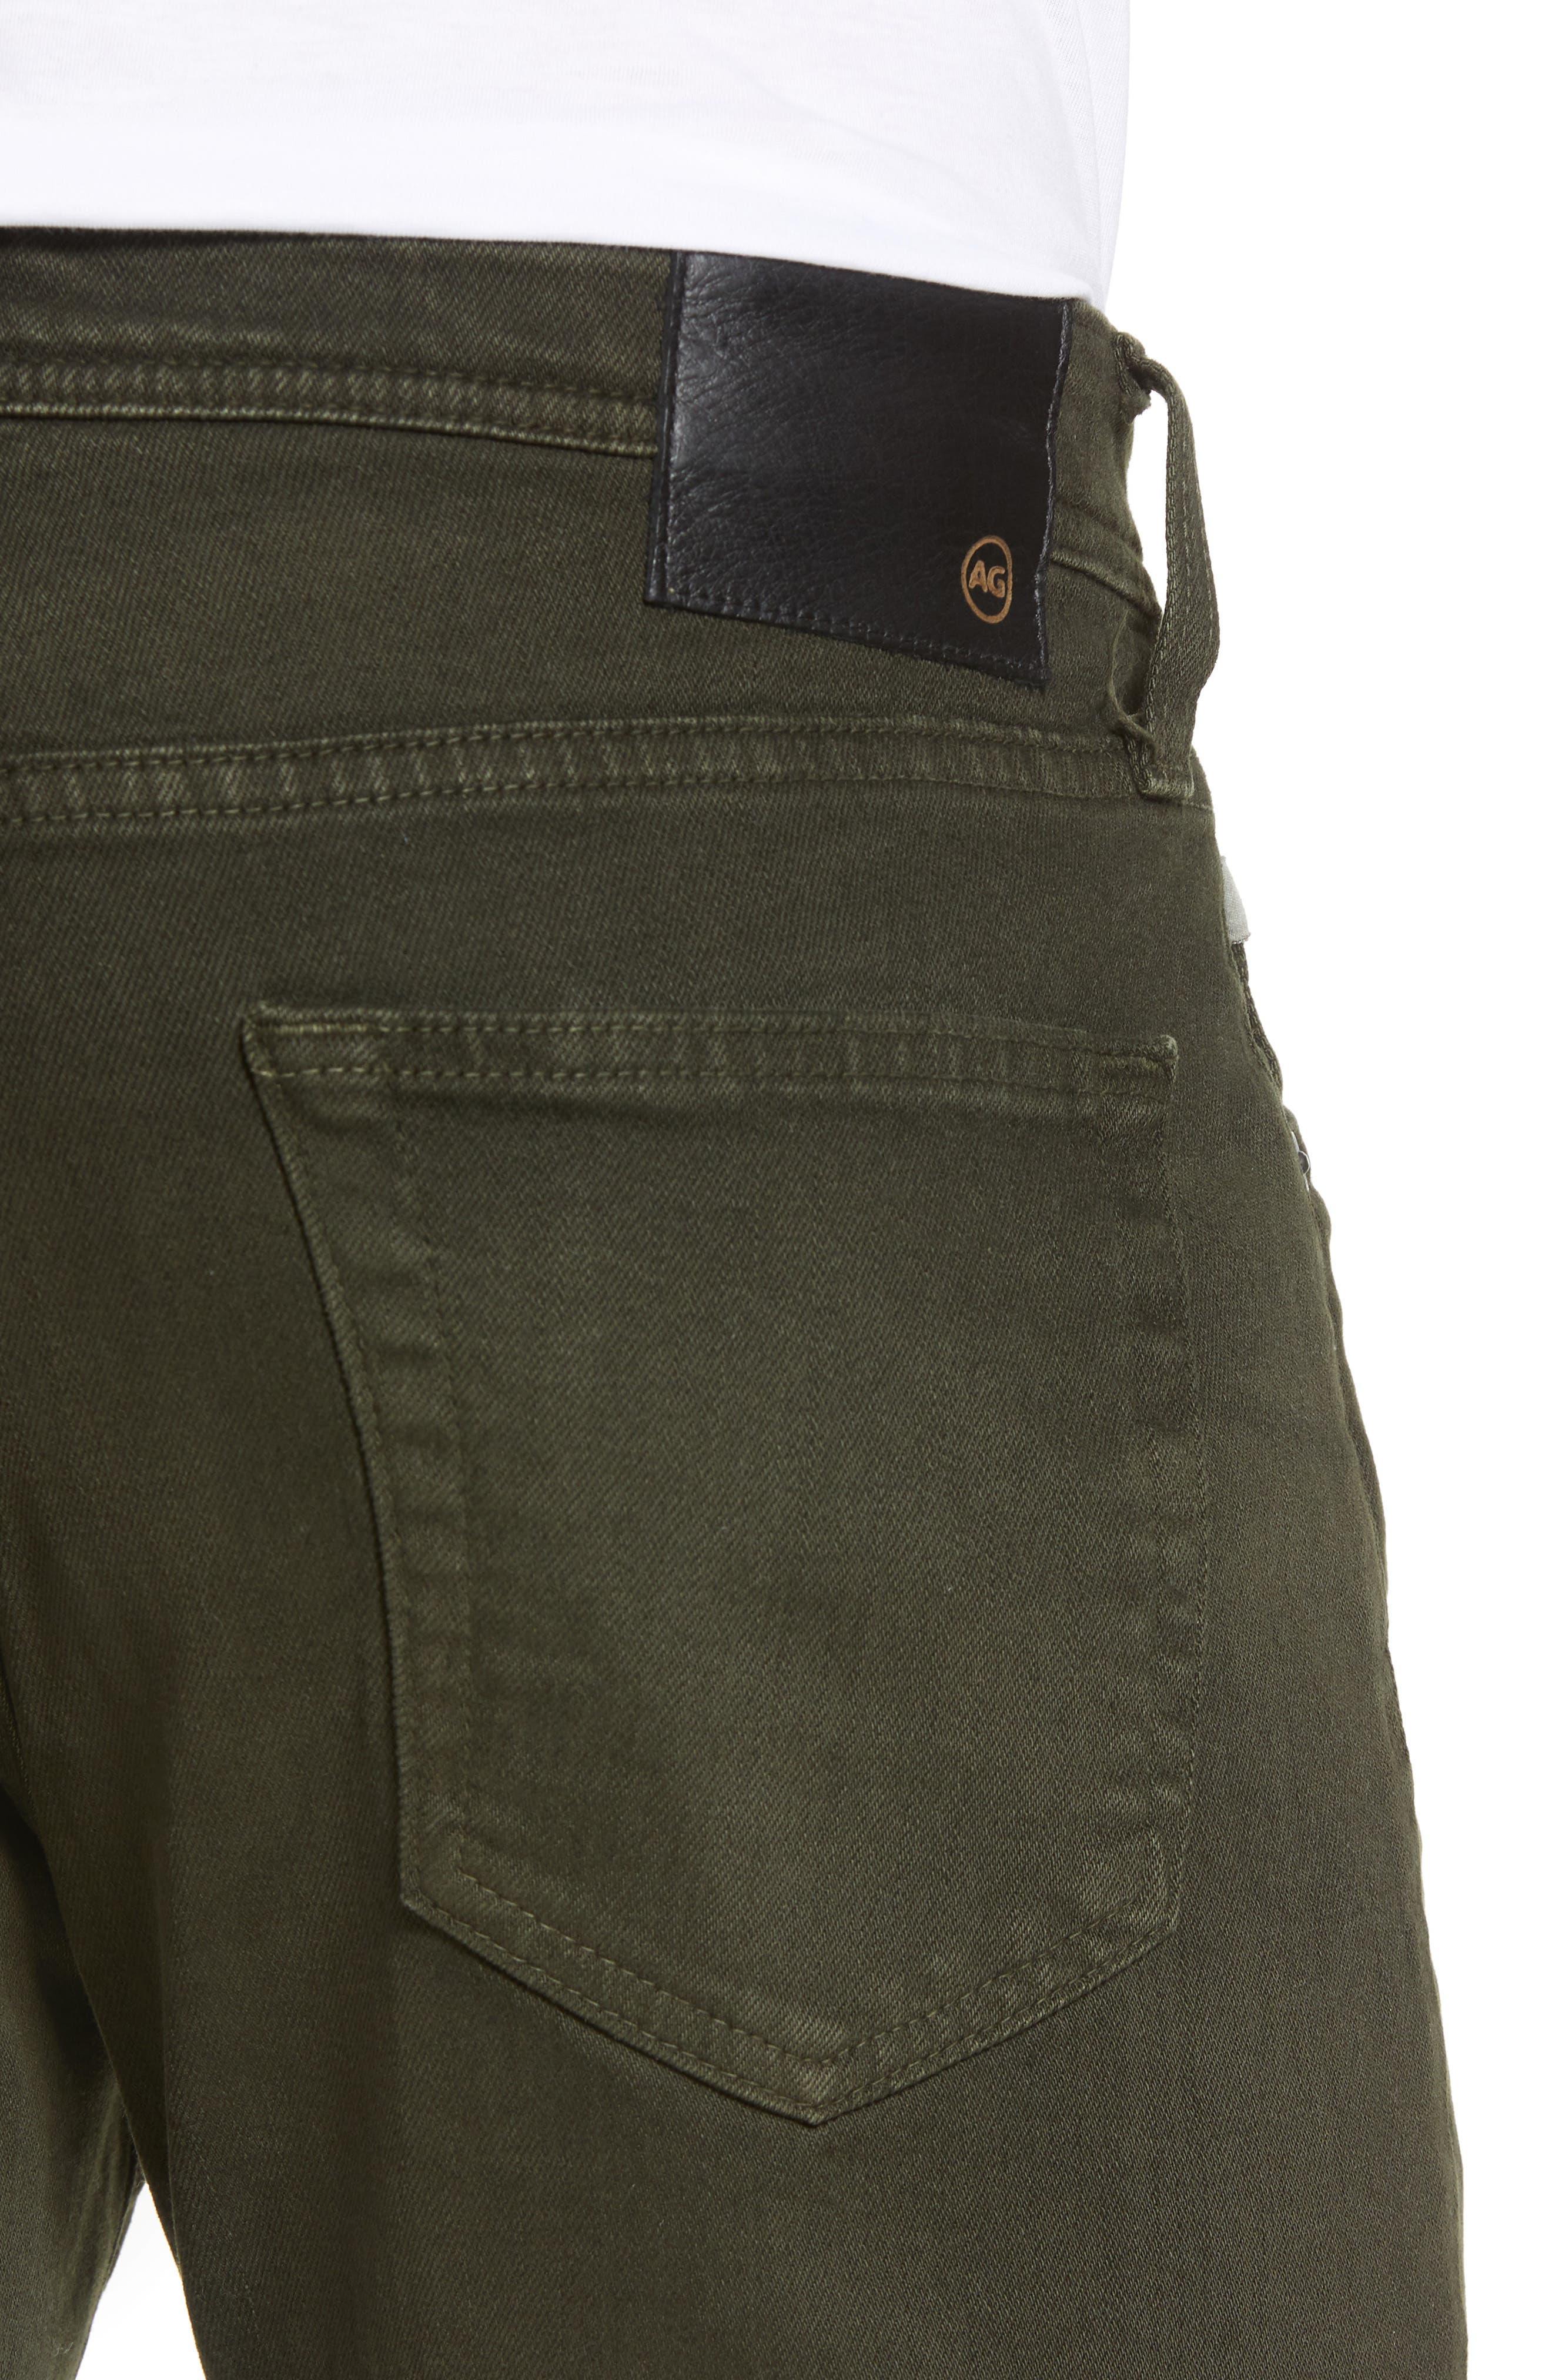 Tellis Slim Fit Jeans,                             Alternate thumbnail 4, color,                             7 YEARS OAK GROVE